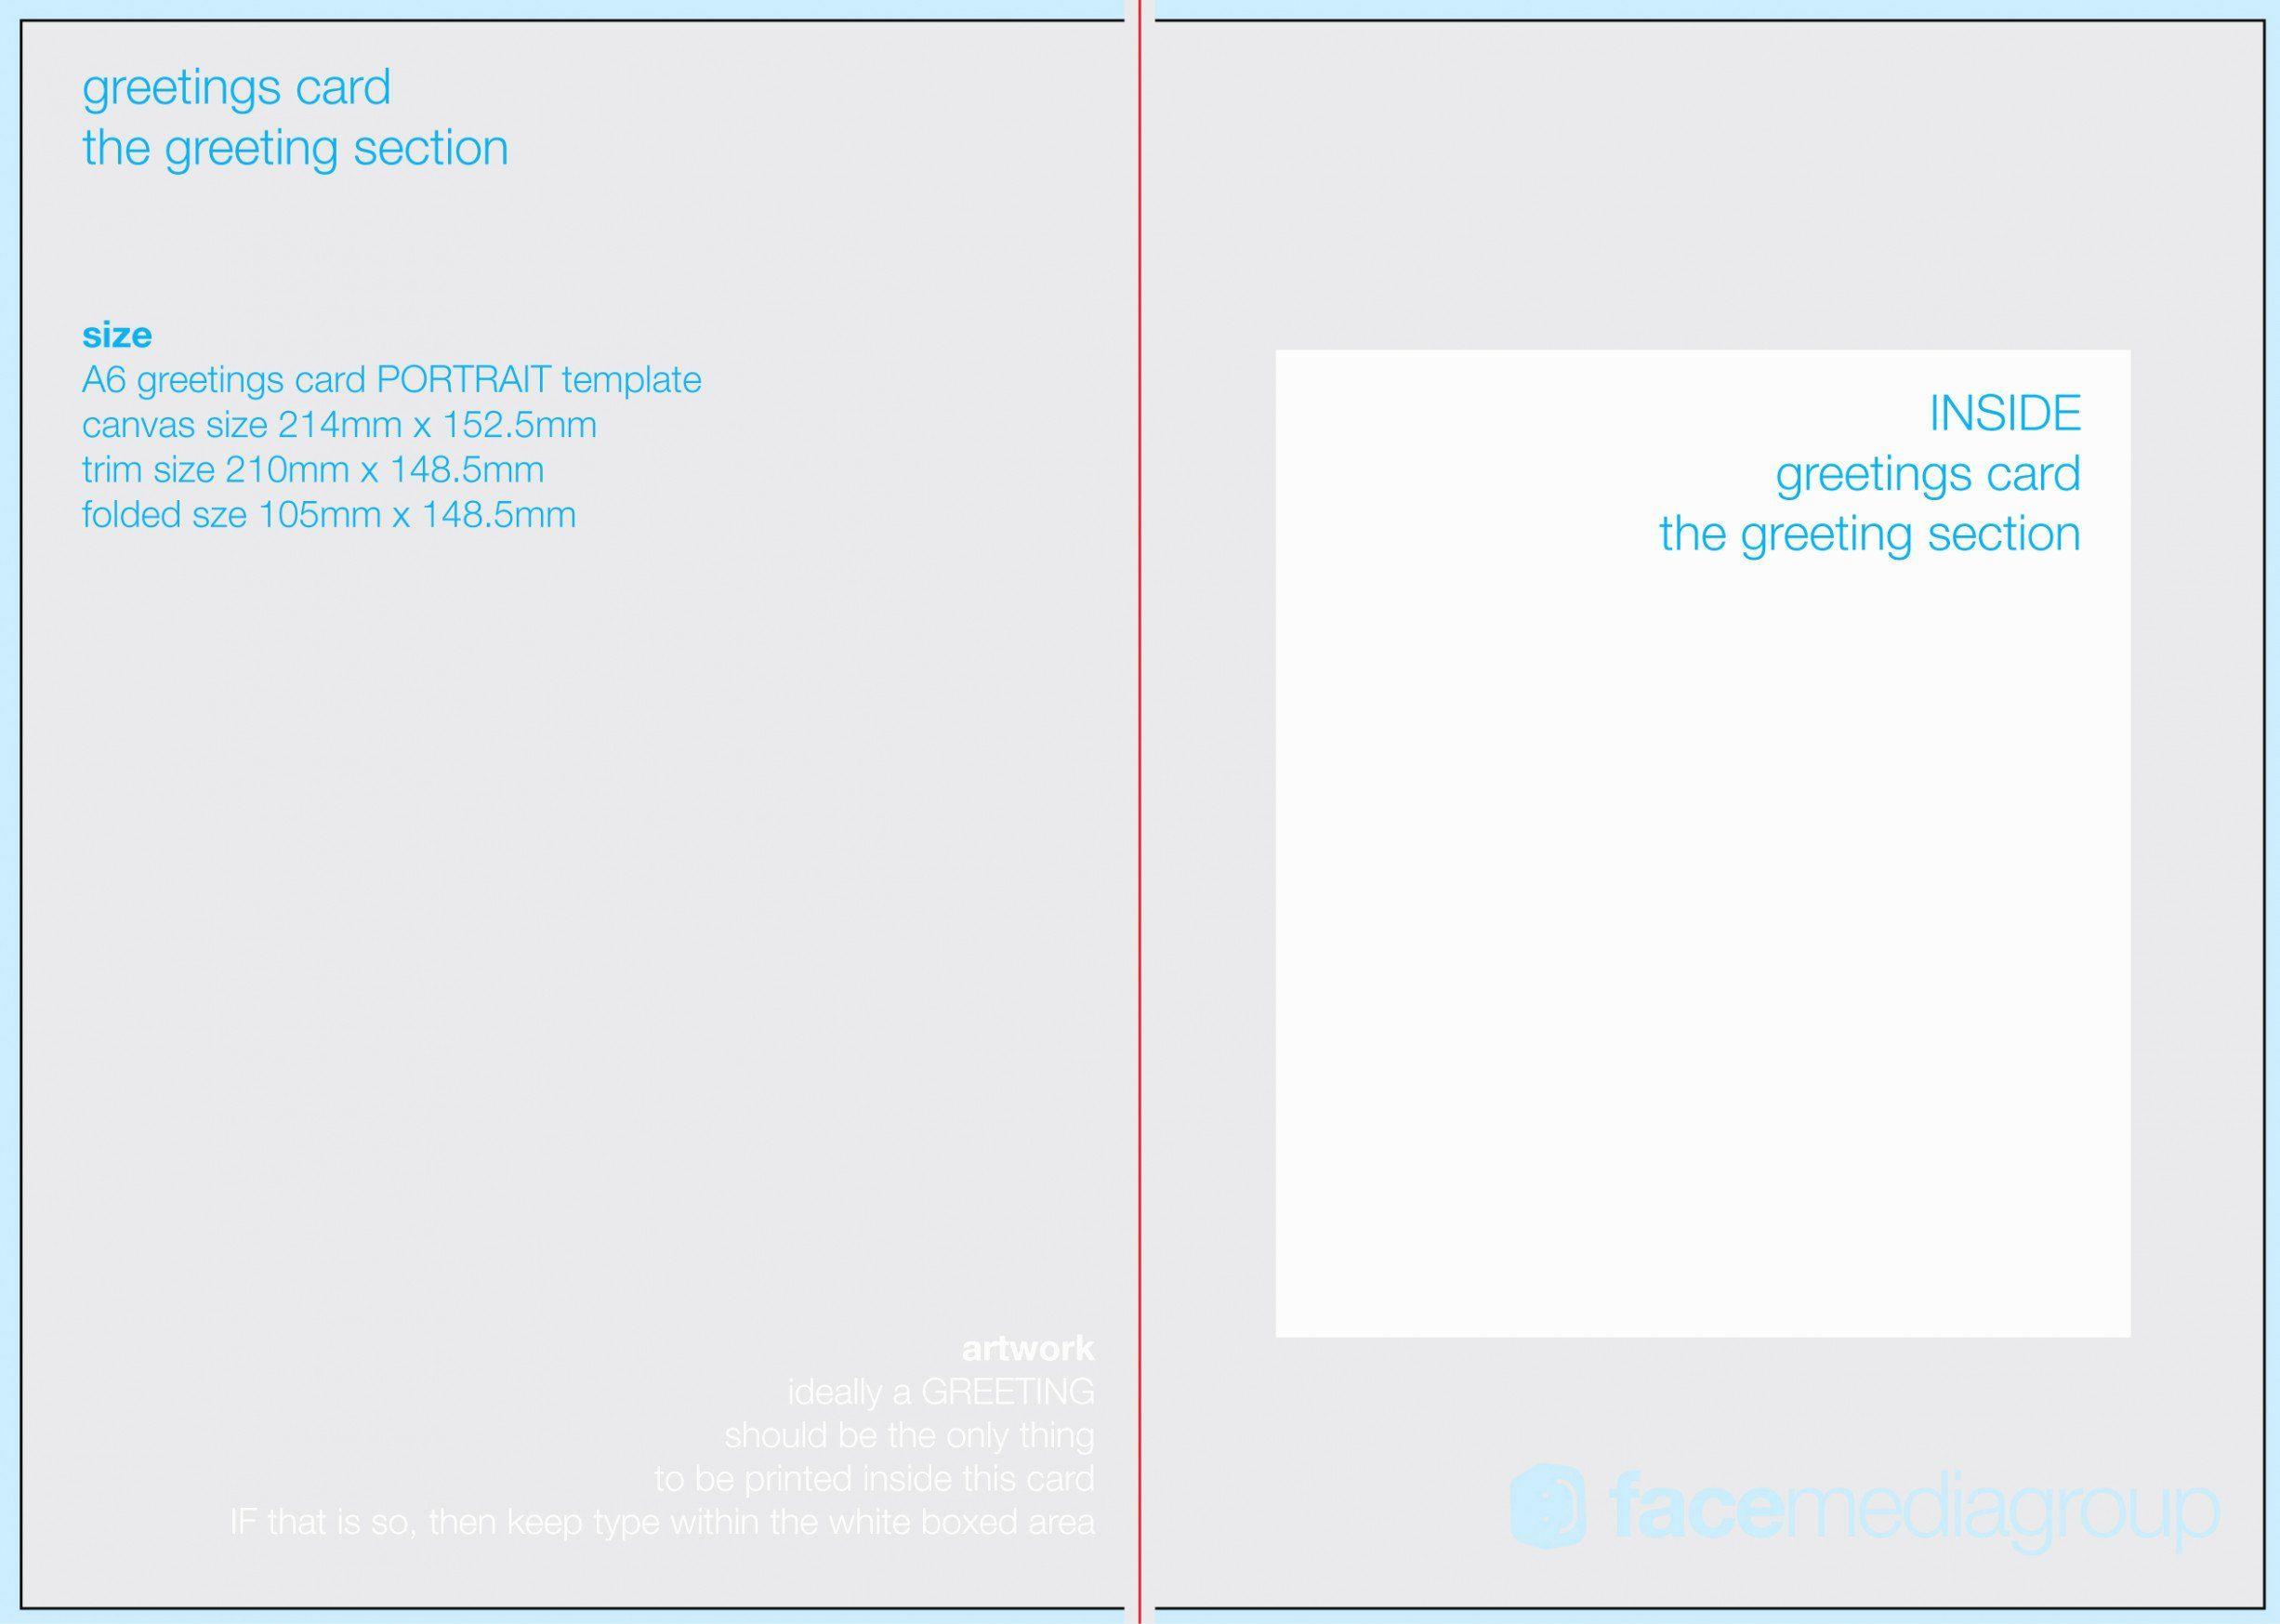 006 Stupendou Birthday Card Template Photoshop Design  Greeting Format 4x6 FreeFull